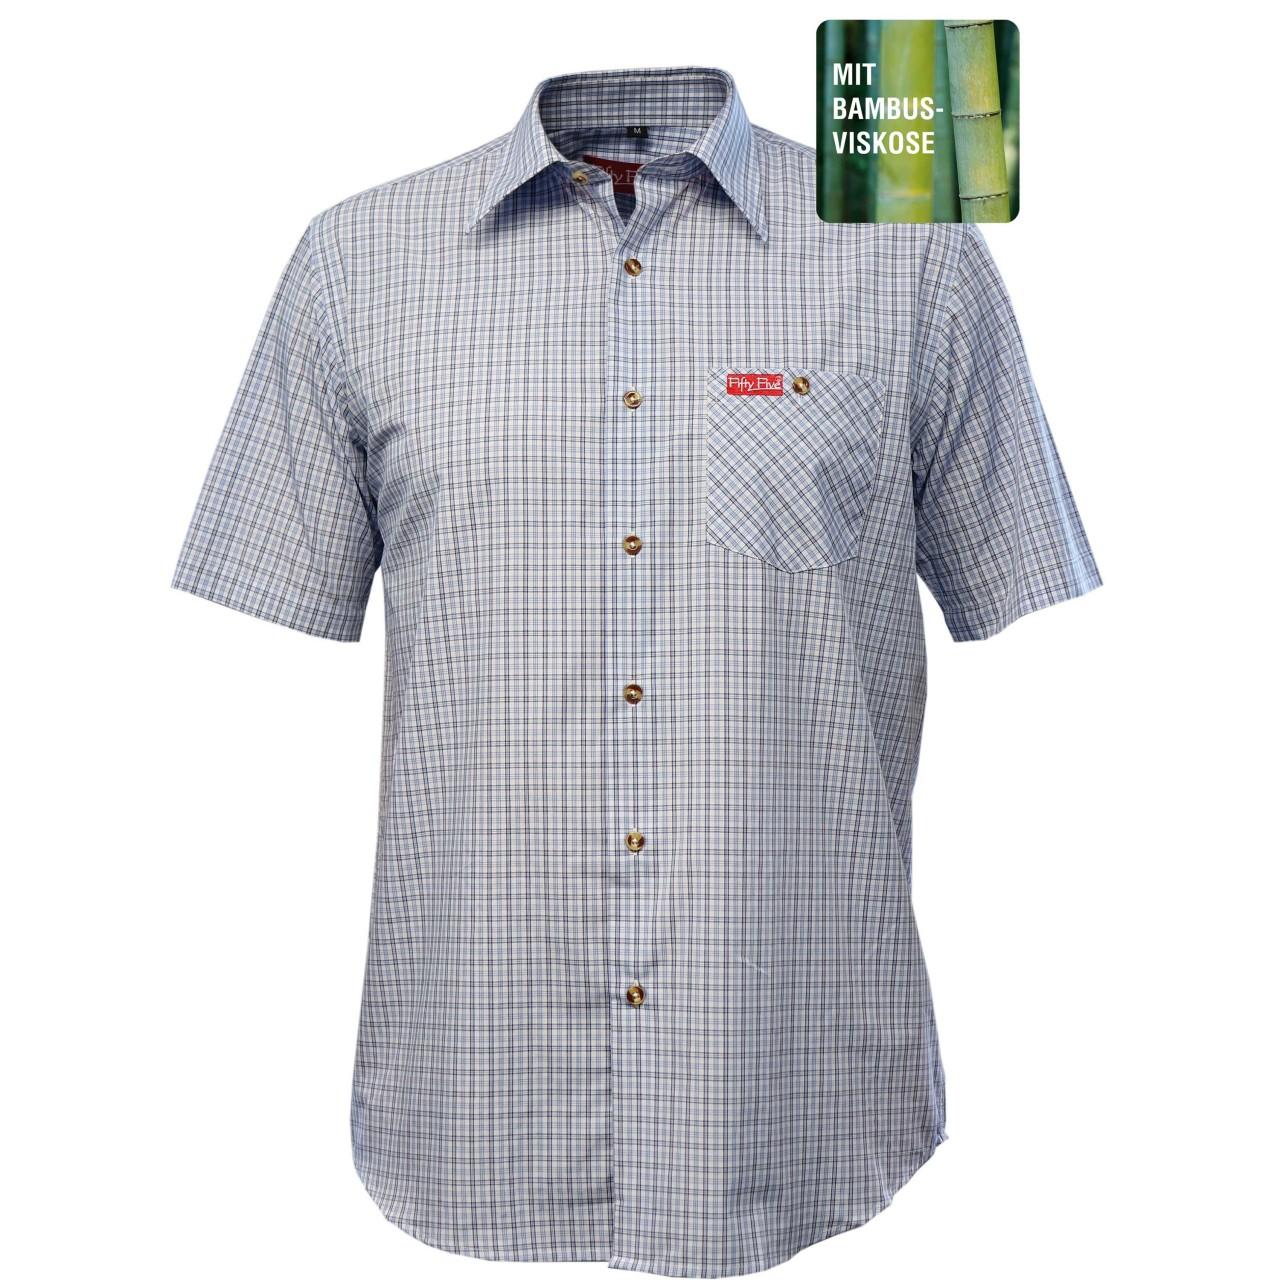 uk availability 42296 165b0 Herren Wanderhemd aus Bambus-Viskose